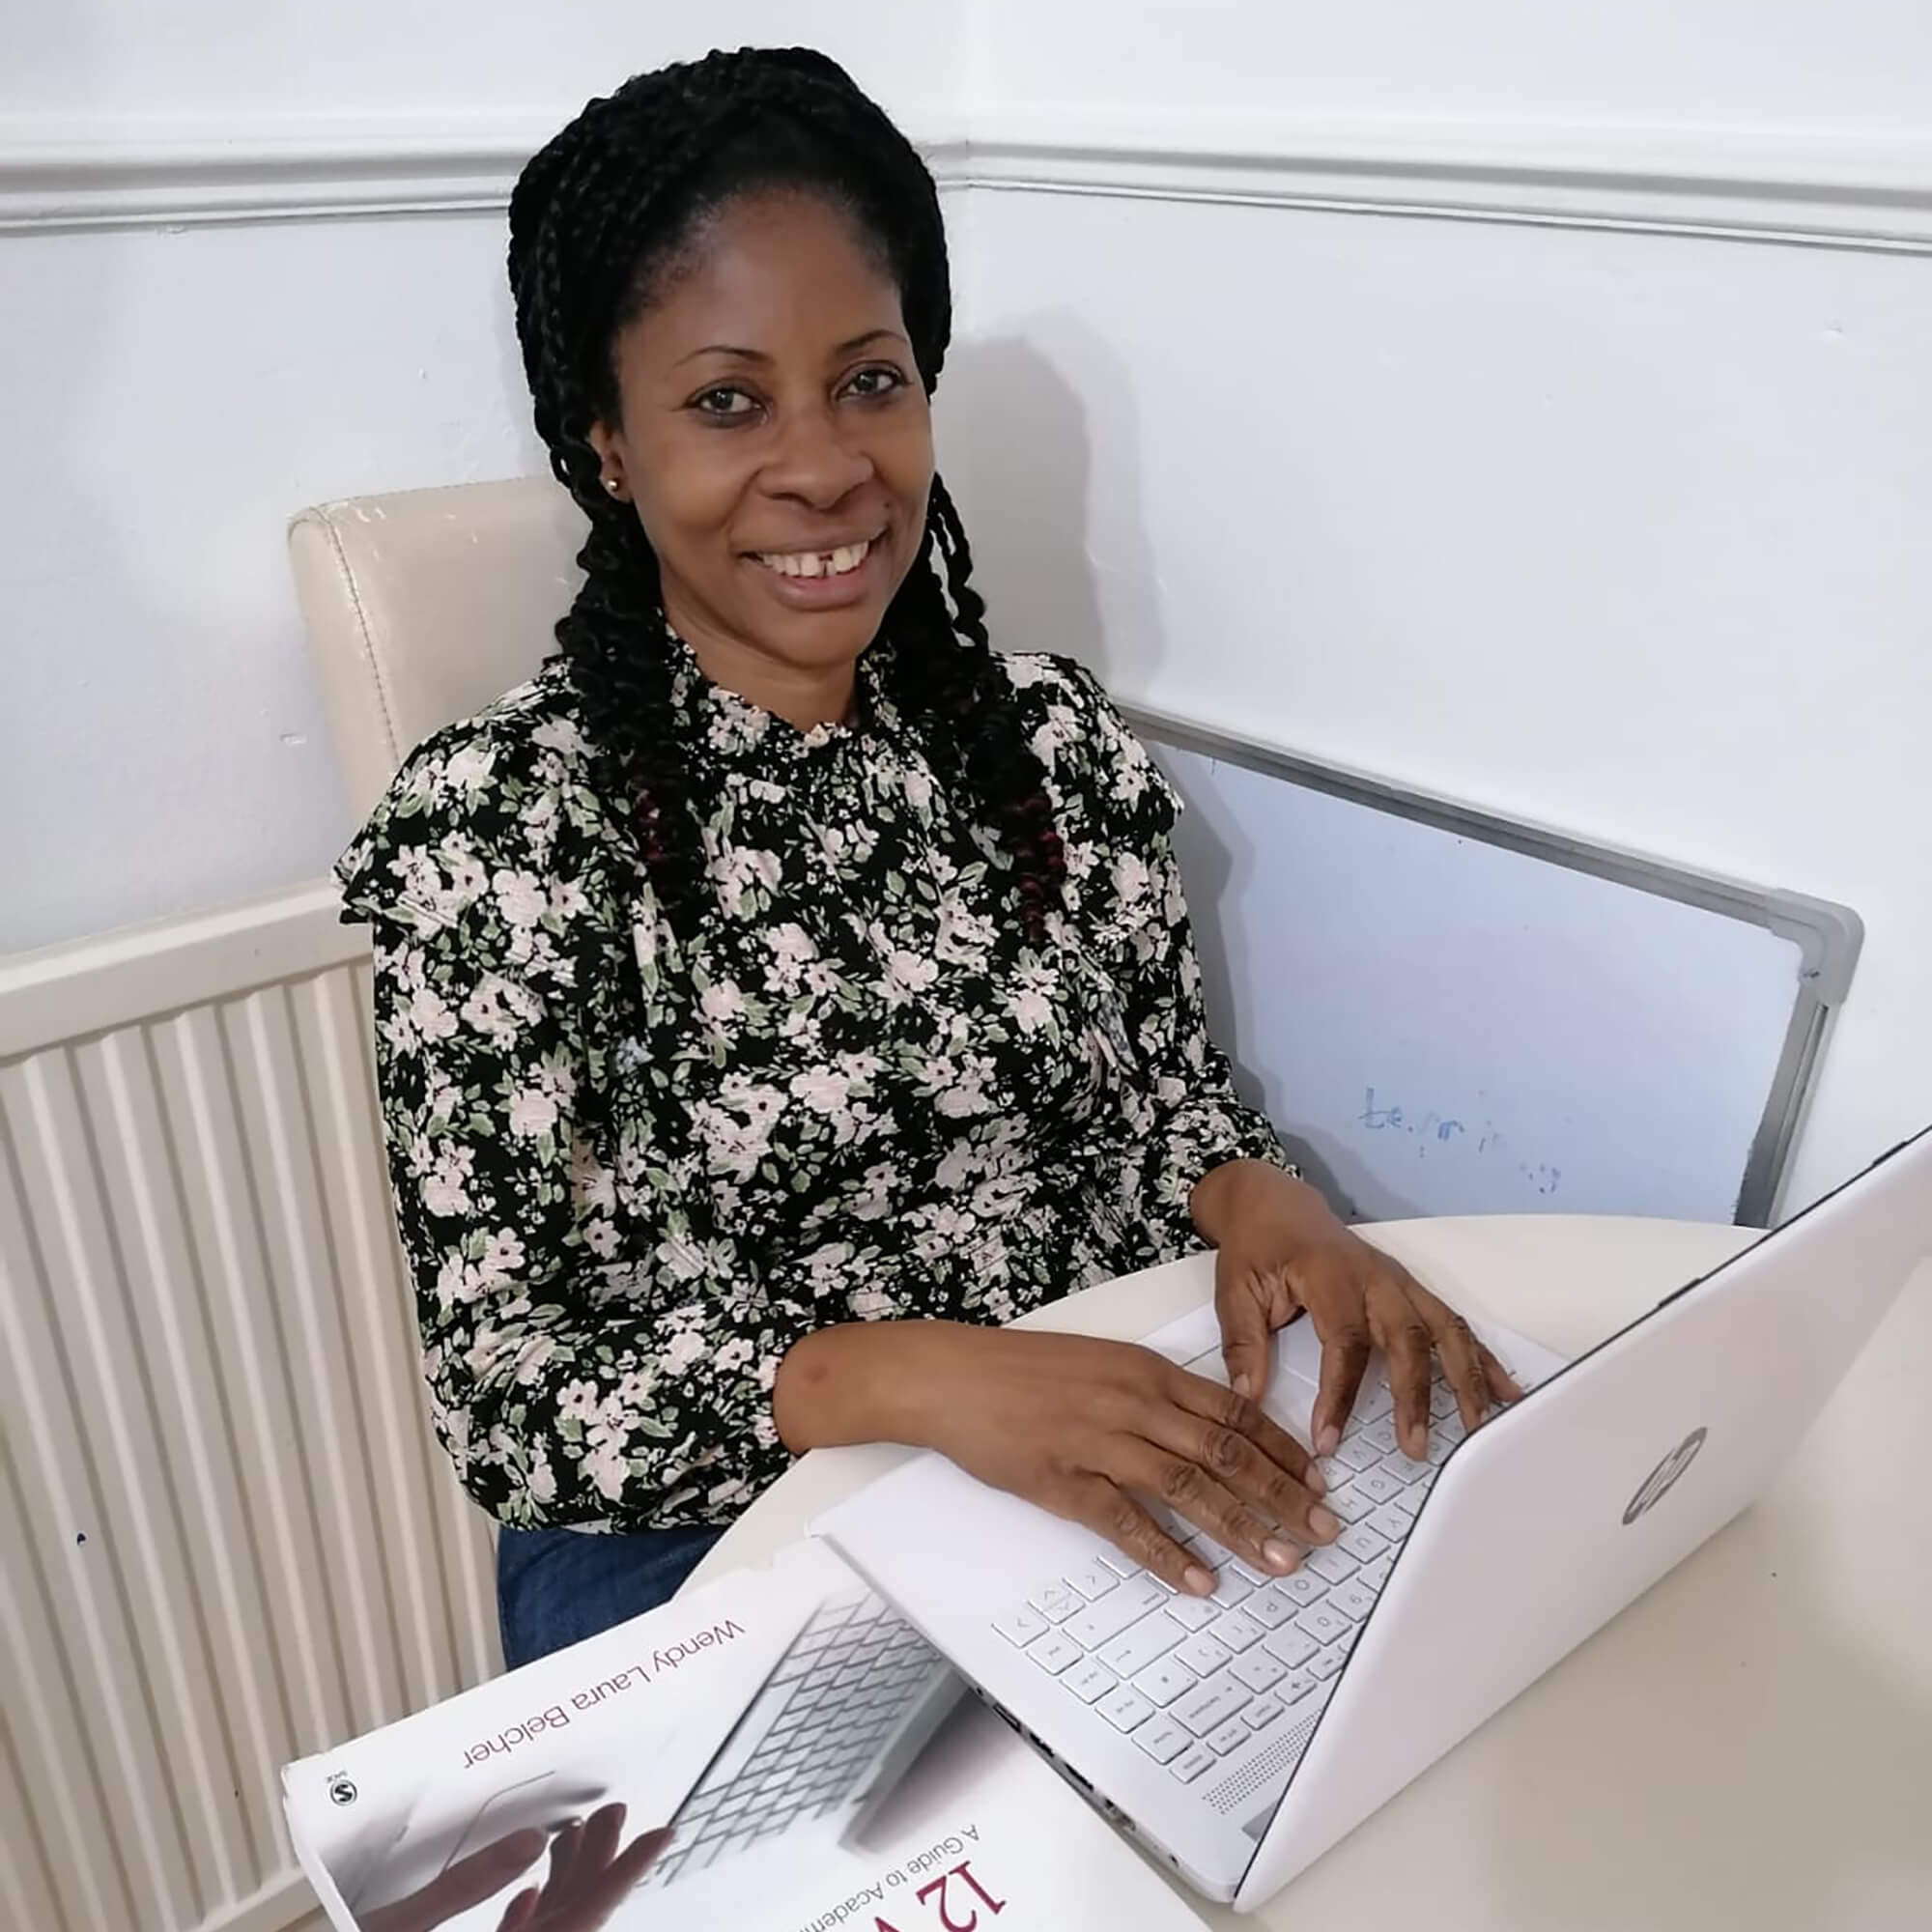 Adetutu sitting a a desk typing on a laptop.